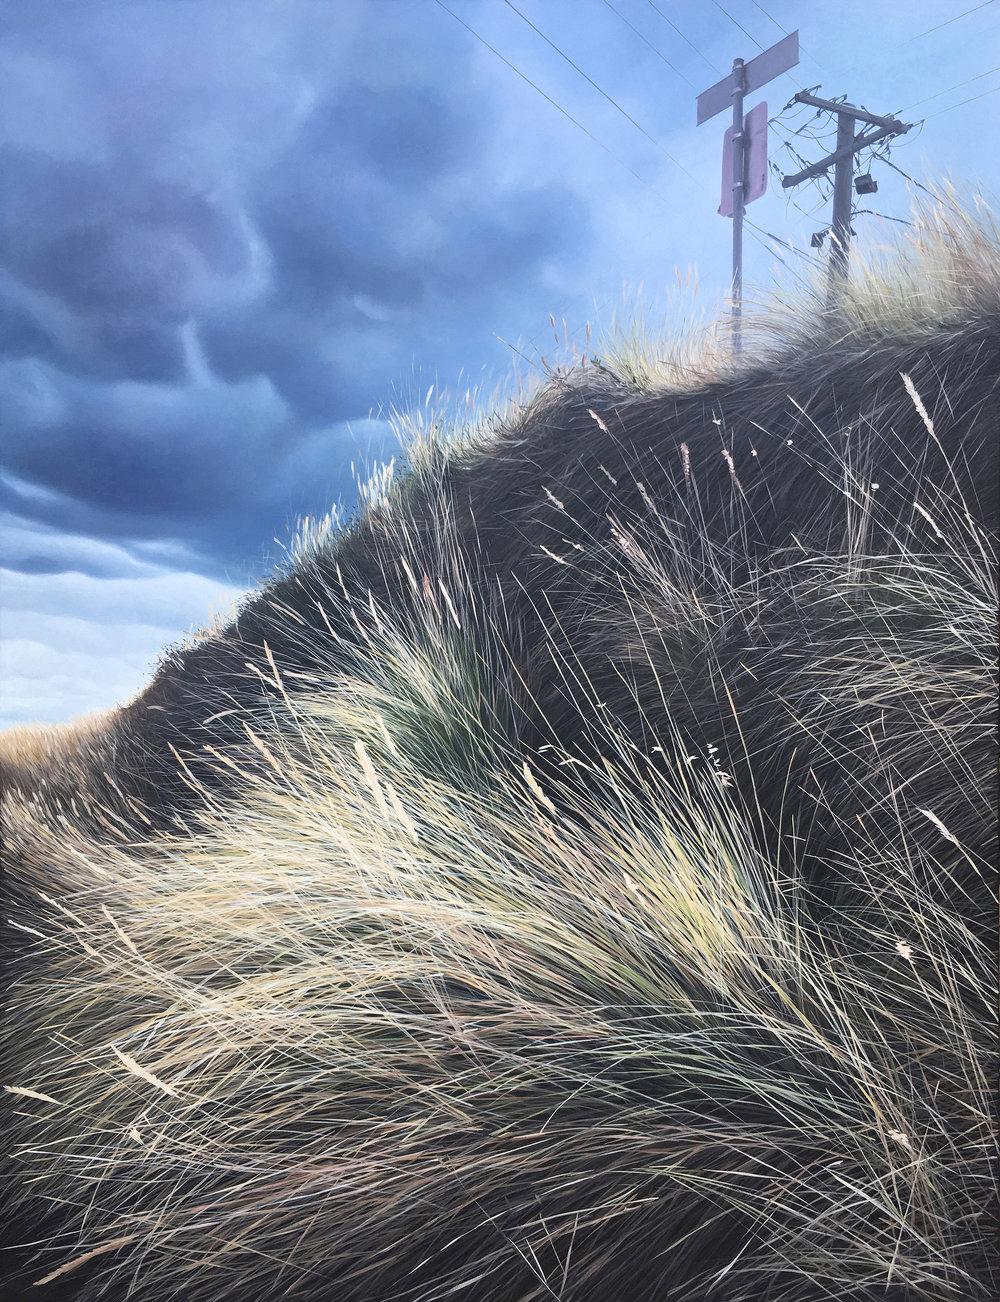 - View Of A Suburban StreetFinalist 2018 John Leslie Art Prize